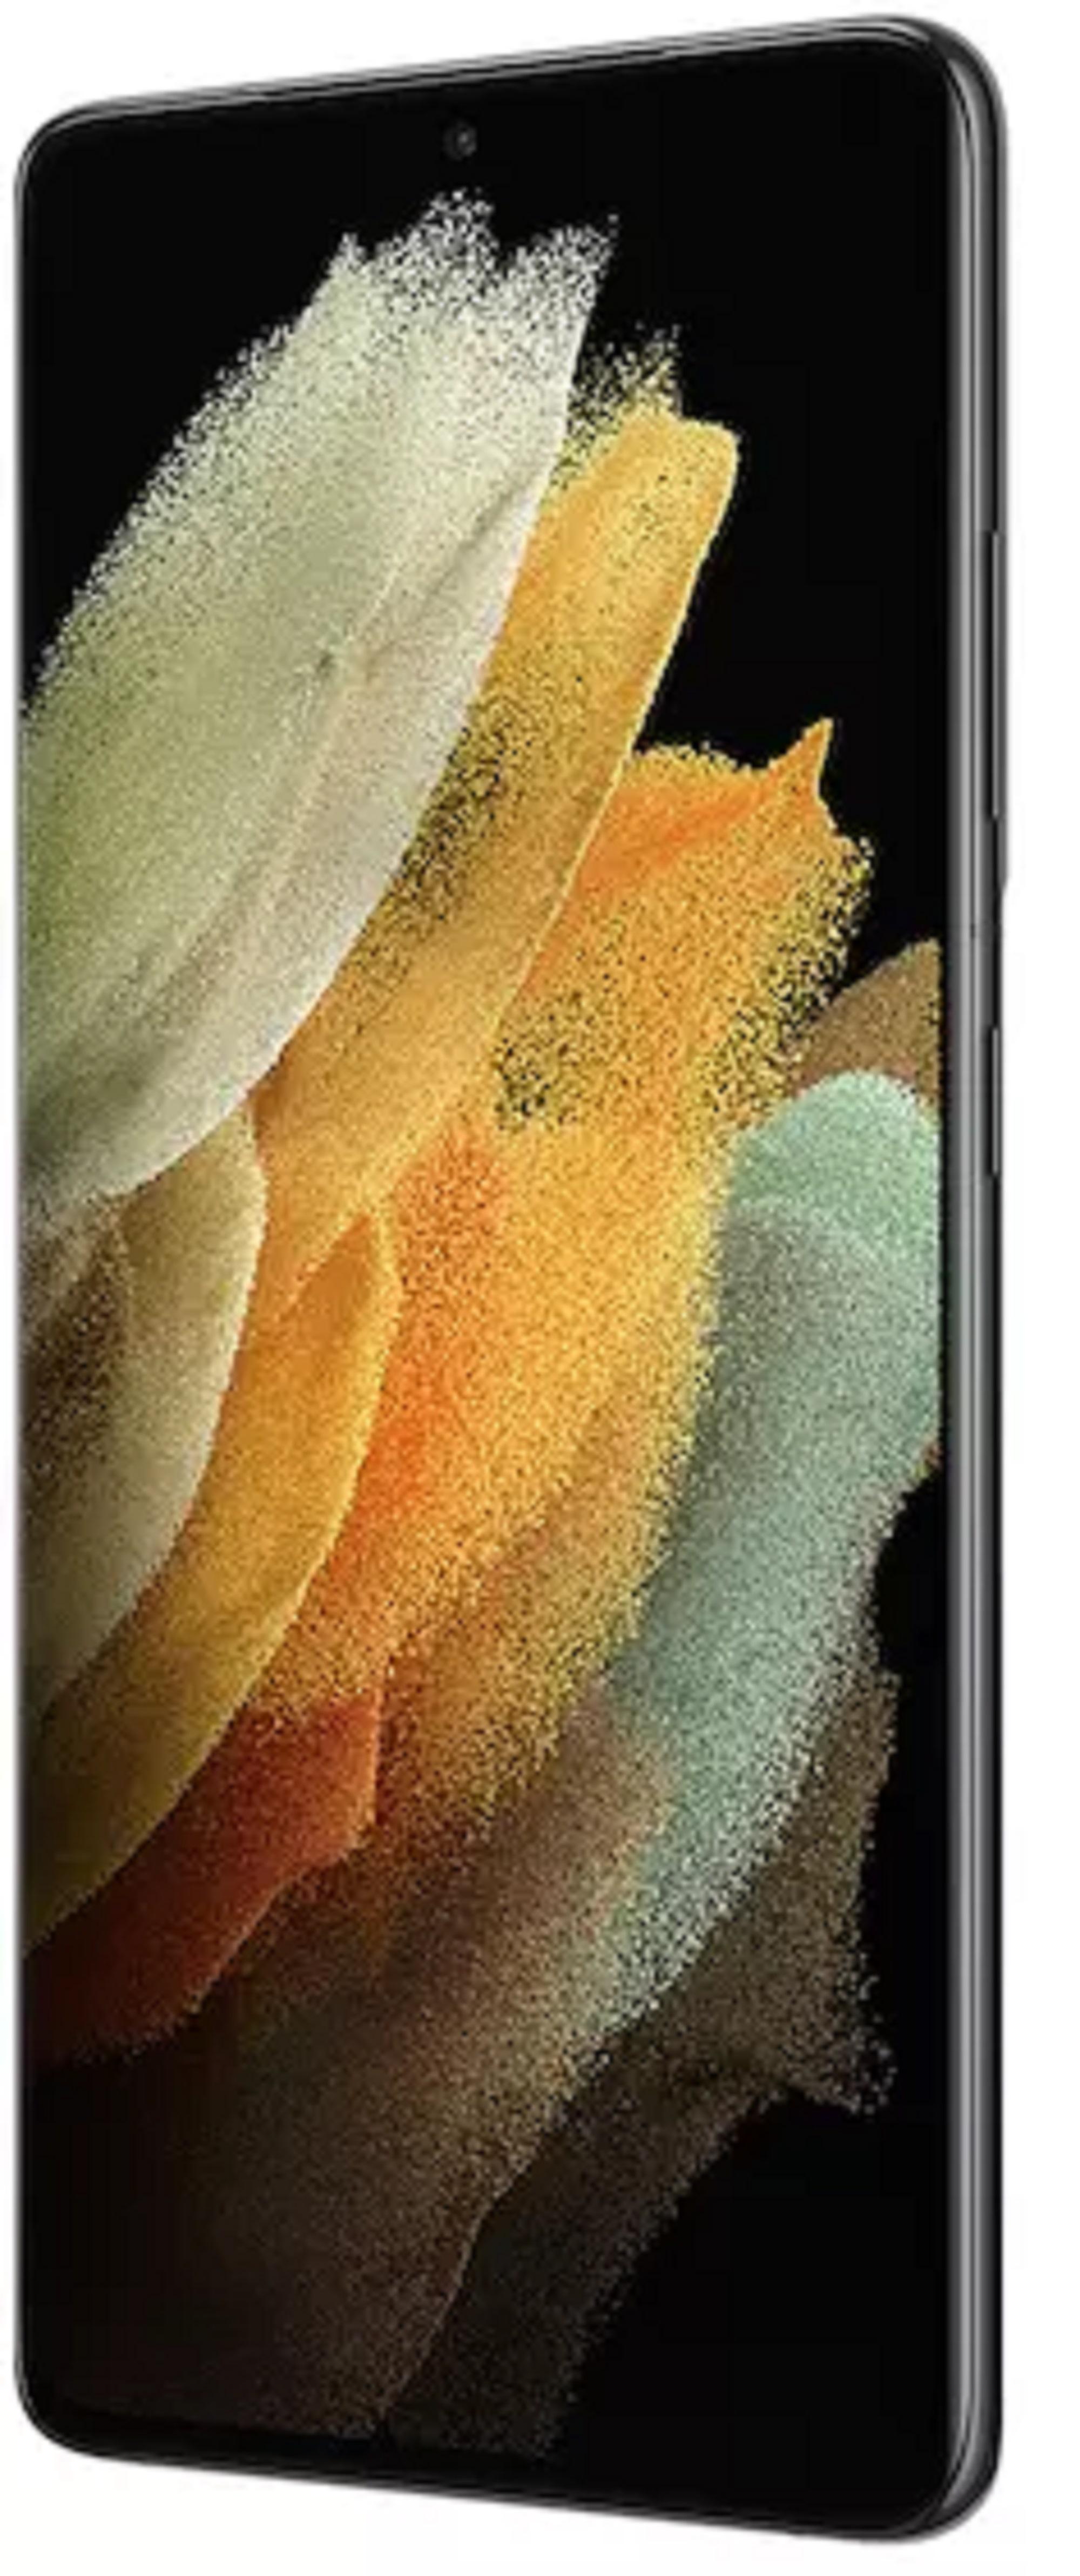 thumbnail 19 - Samsung Galaxy G998U S21 Ultra 5G 128GB Unlocked Smartphone - Excellent